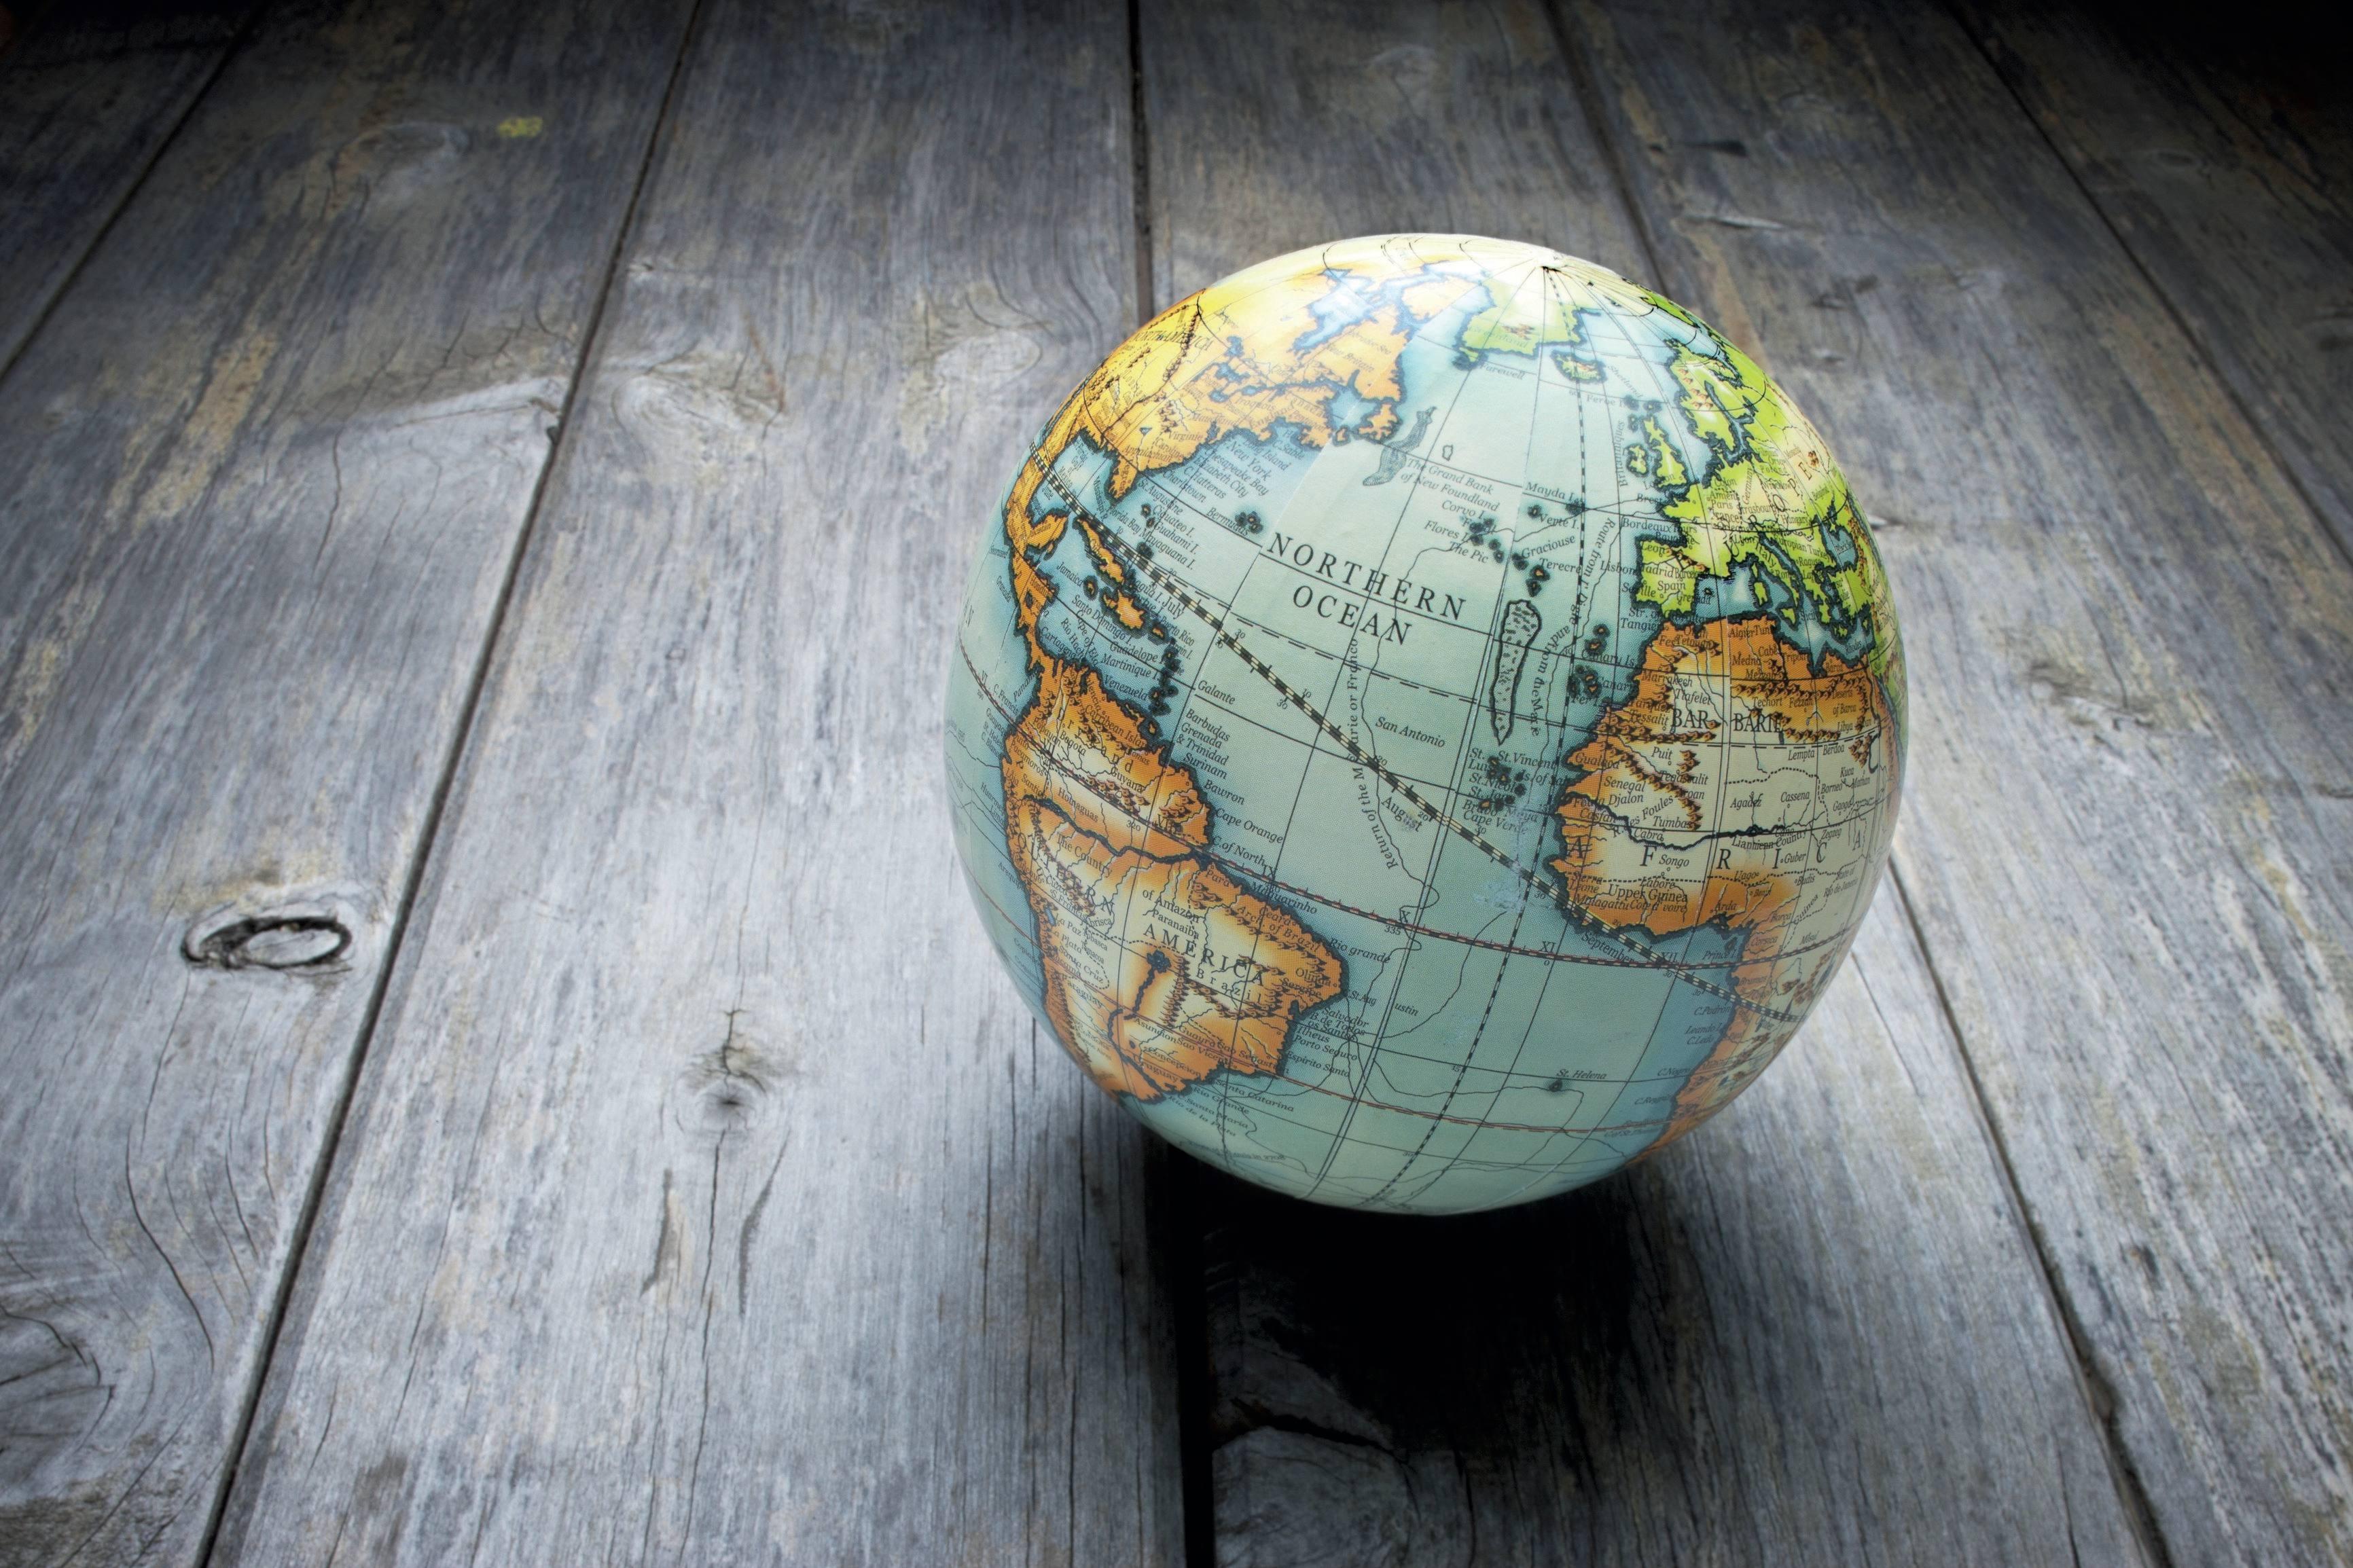 Green bond investors demand transparency